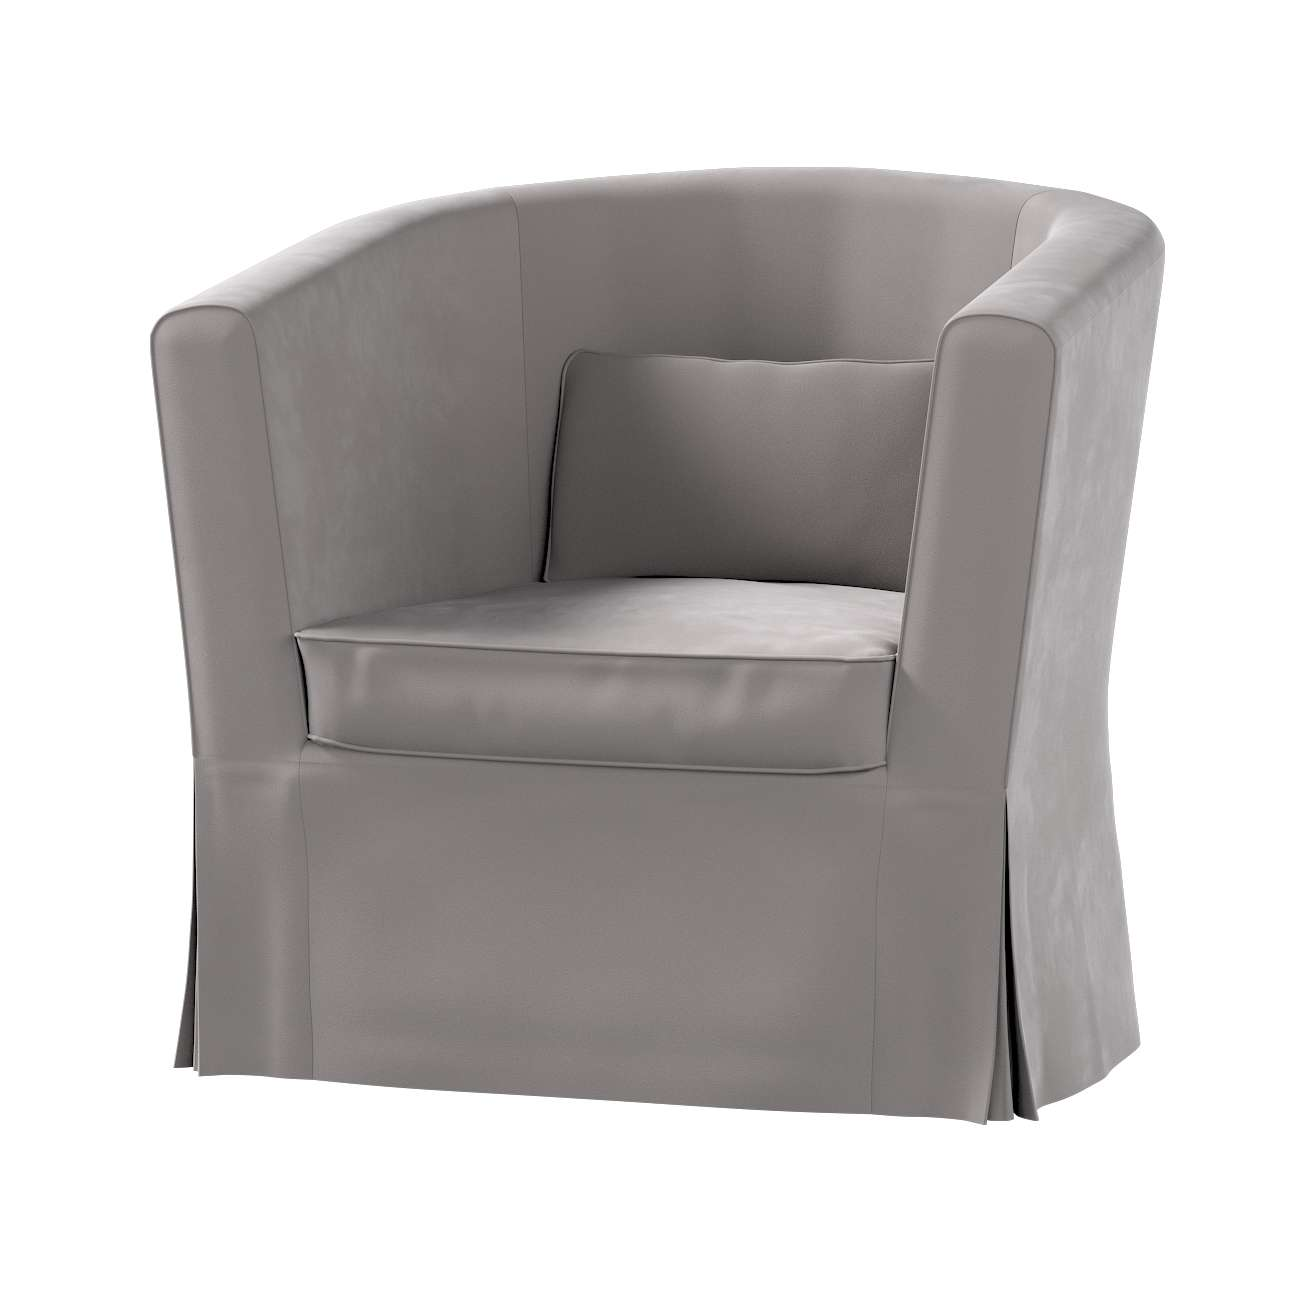 Pokrowiec na fotel Ektorp Tullsta w kolekcji Velvet, tkanina: 704-11